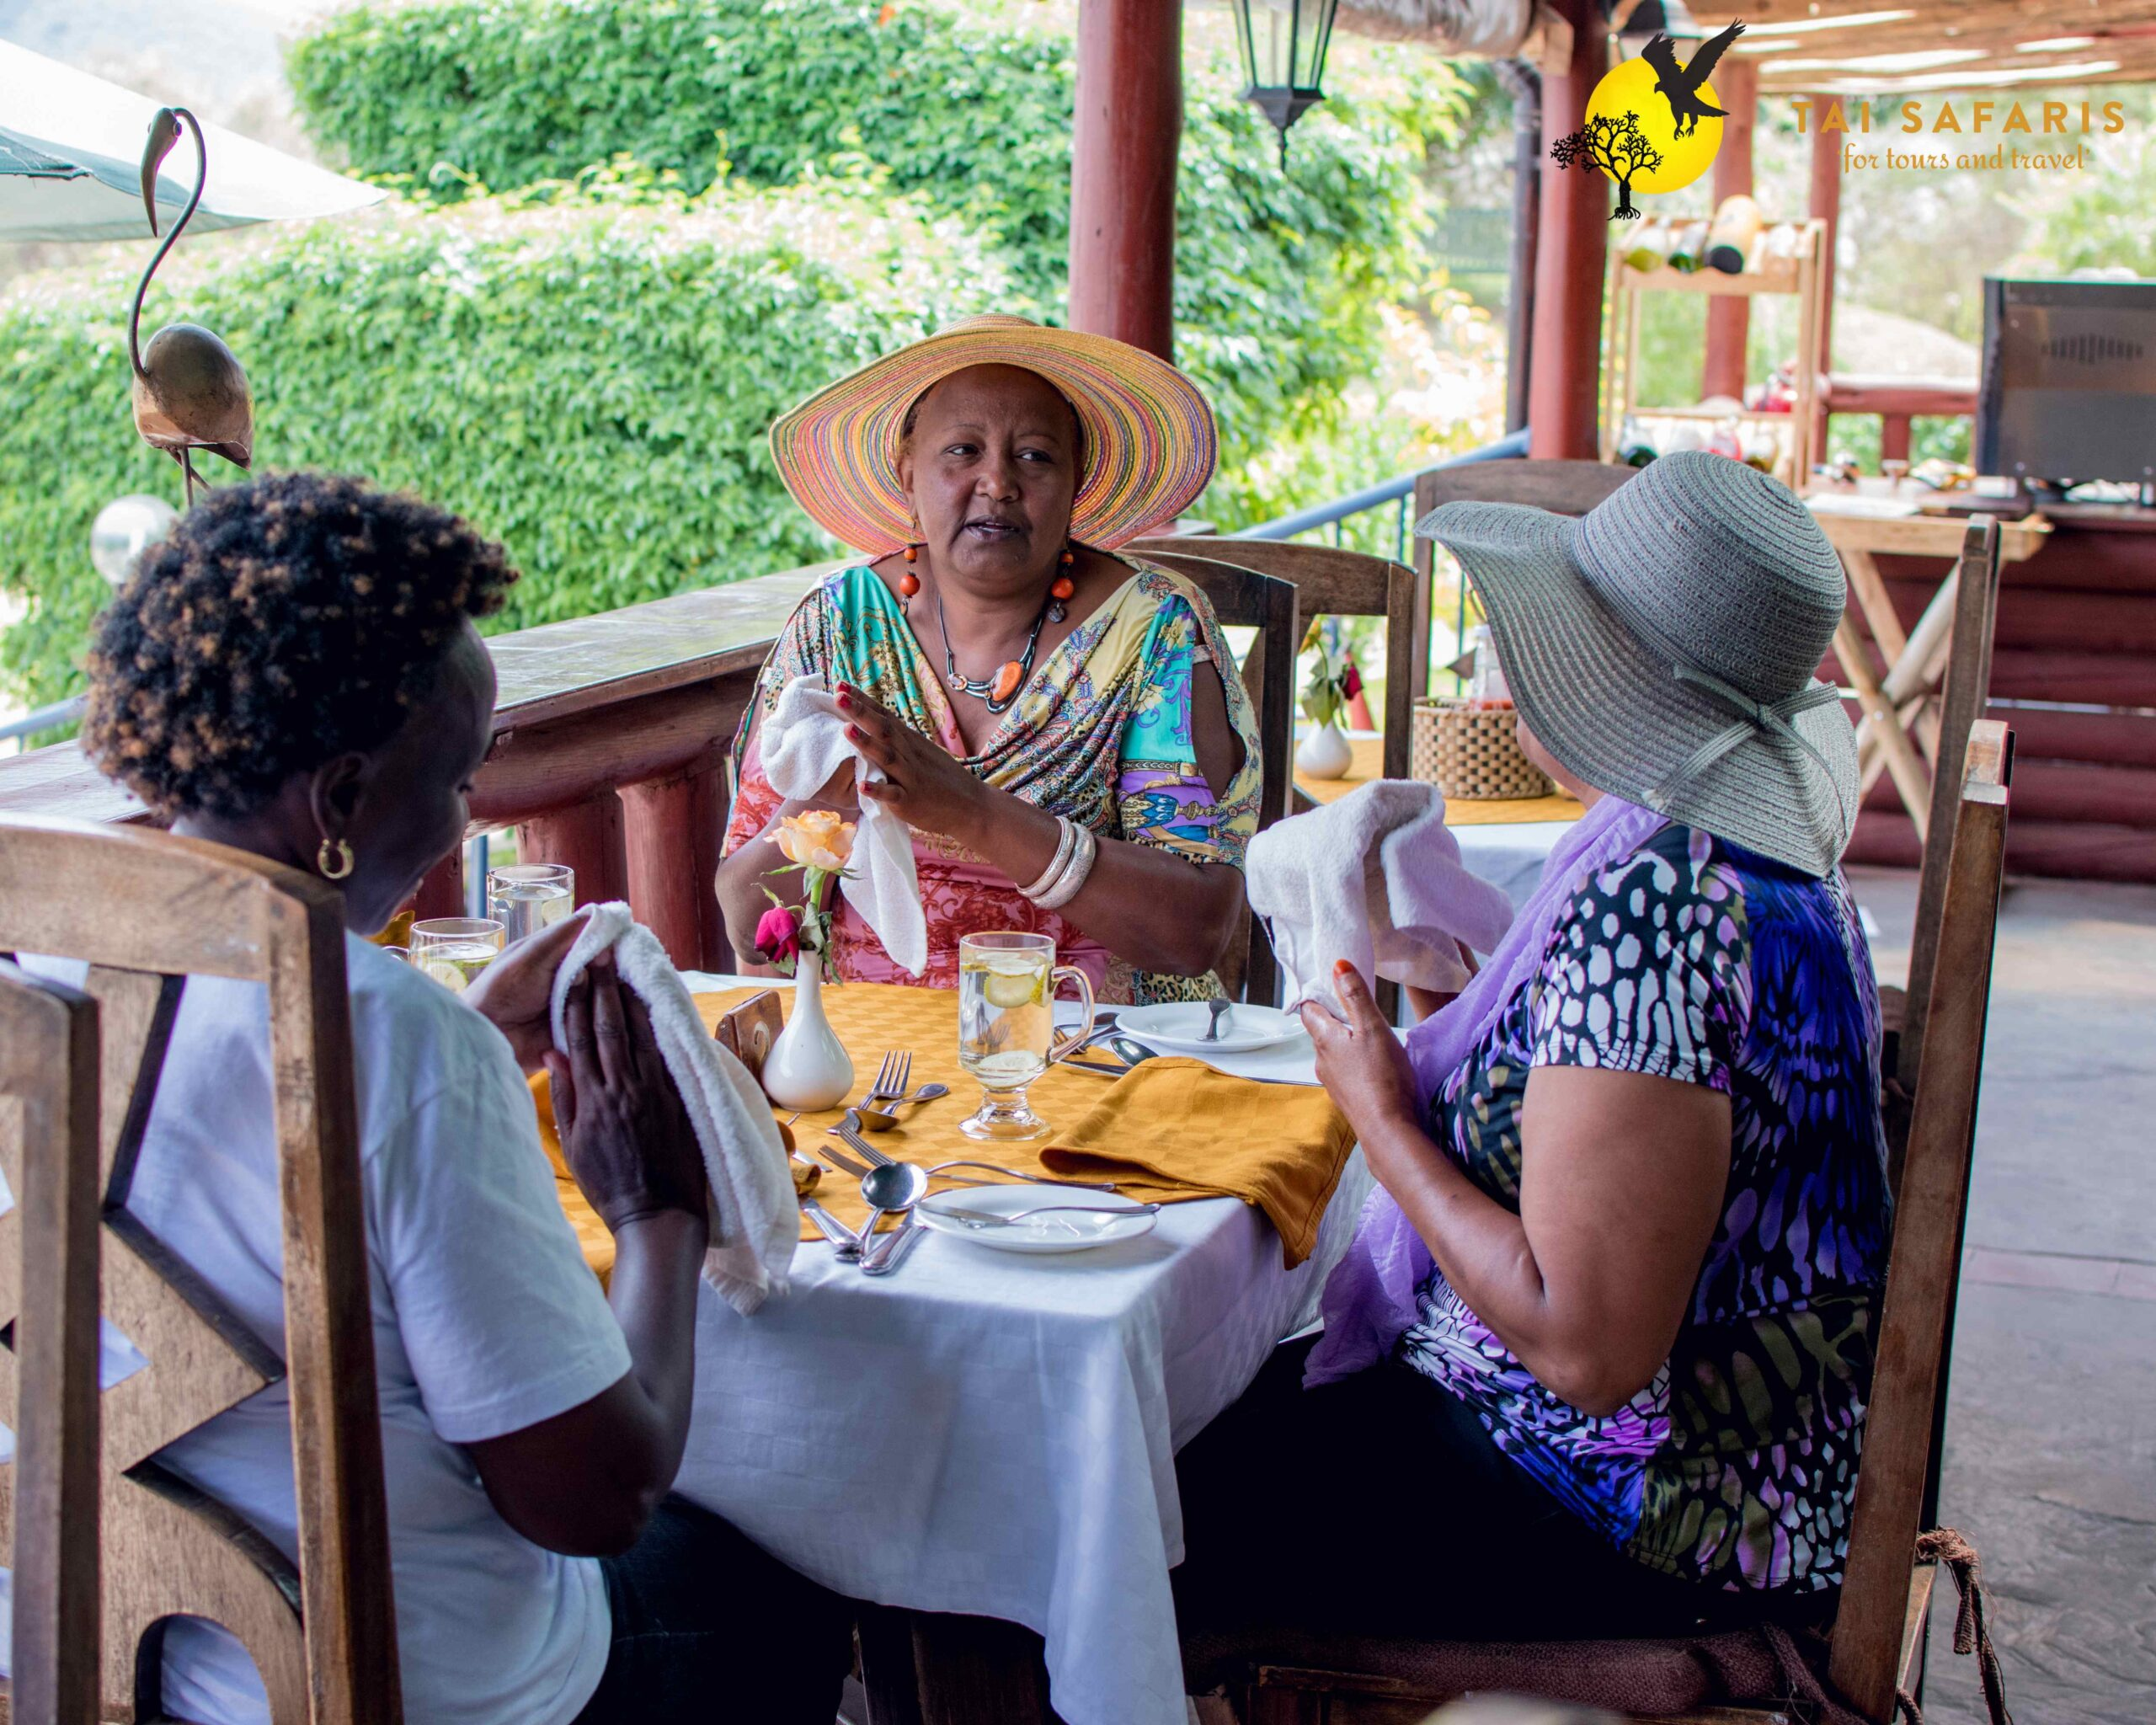 3 Day, 2 Nights Safari to Lake Nakuru ,Lake Elementaita Hotsprings & Kariandusi Archeological Museum and Lake Naivasha